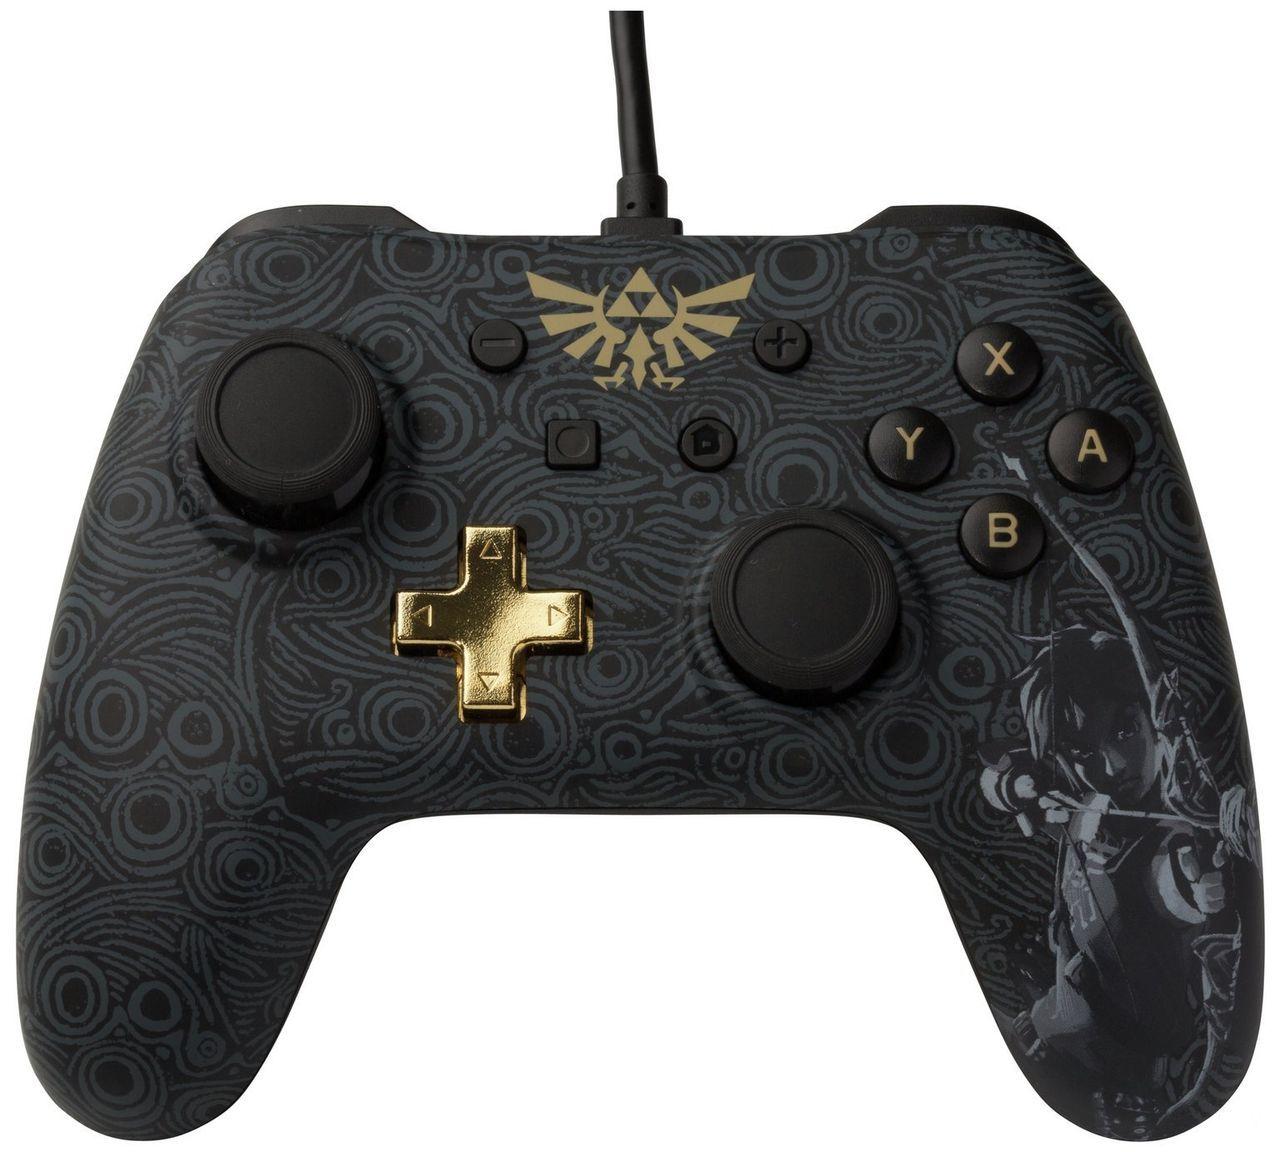 mira-los-nuevos-mandos3-cable-nintendo-switch-power-frikigamers.com